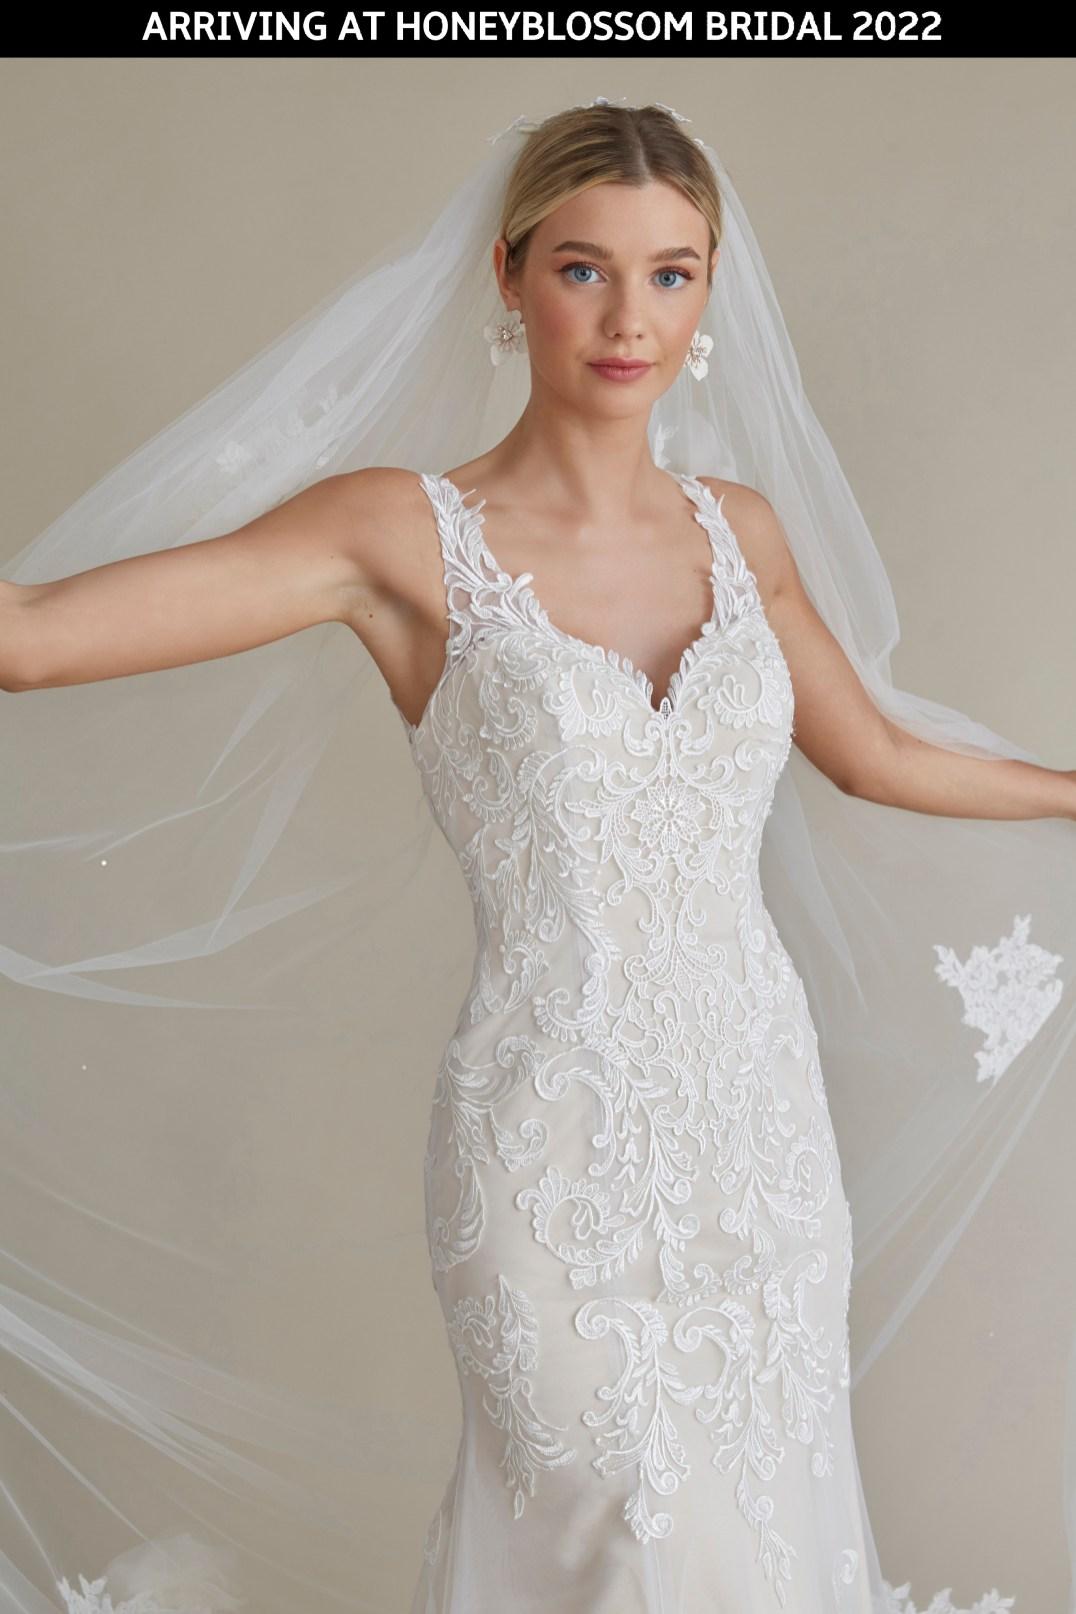 MiaMia Anya wedding dress arriving soon to Honeyblossom Bridal